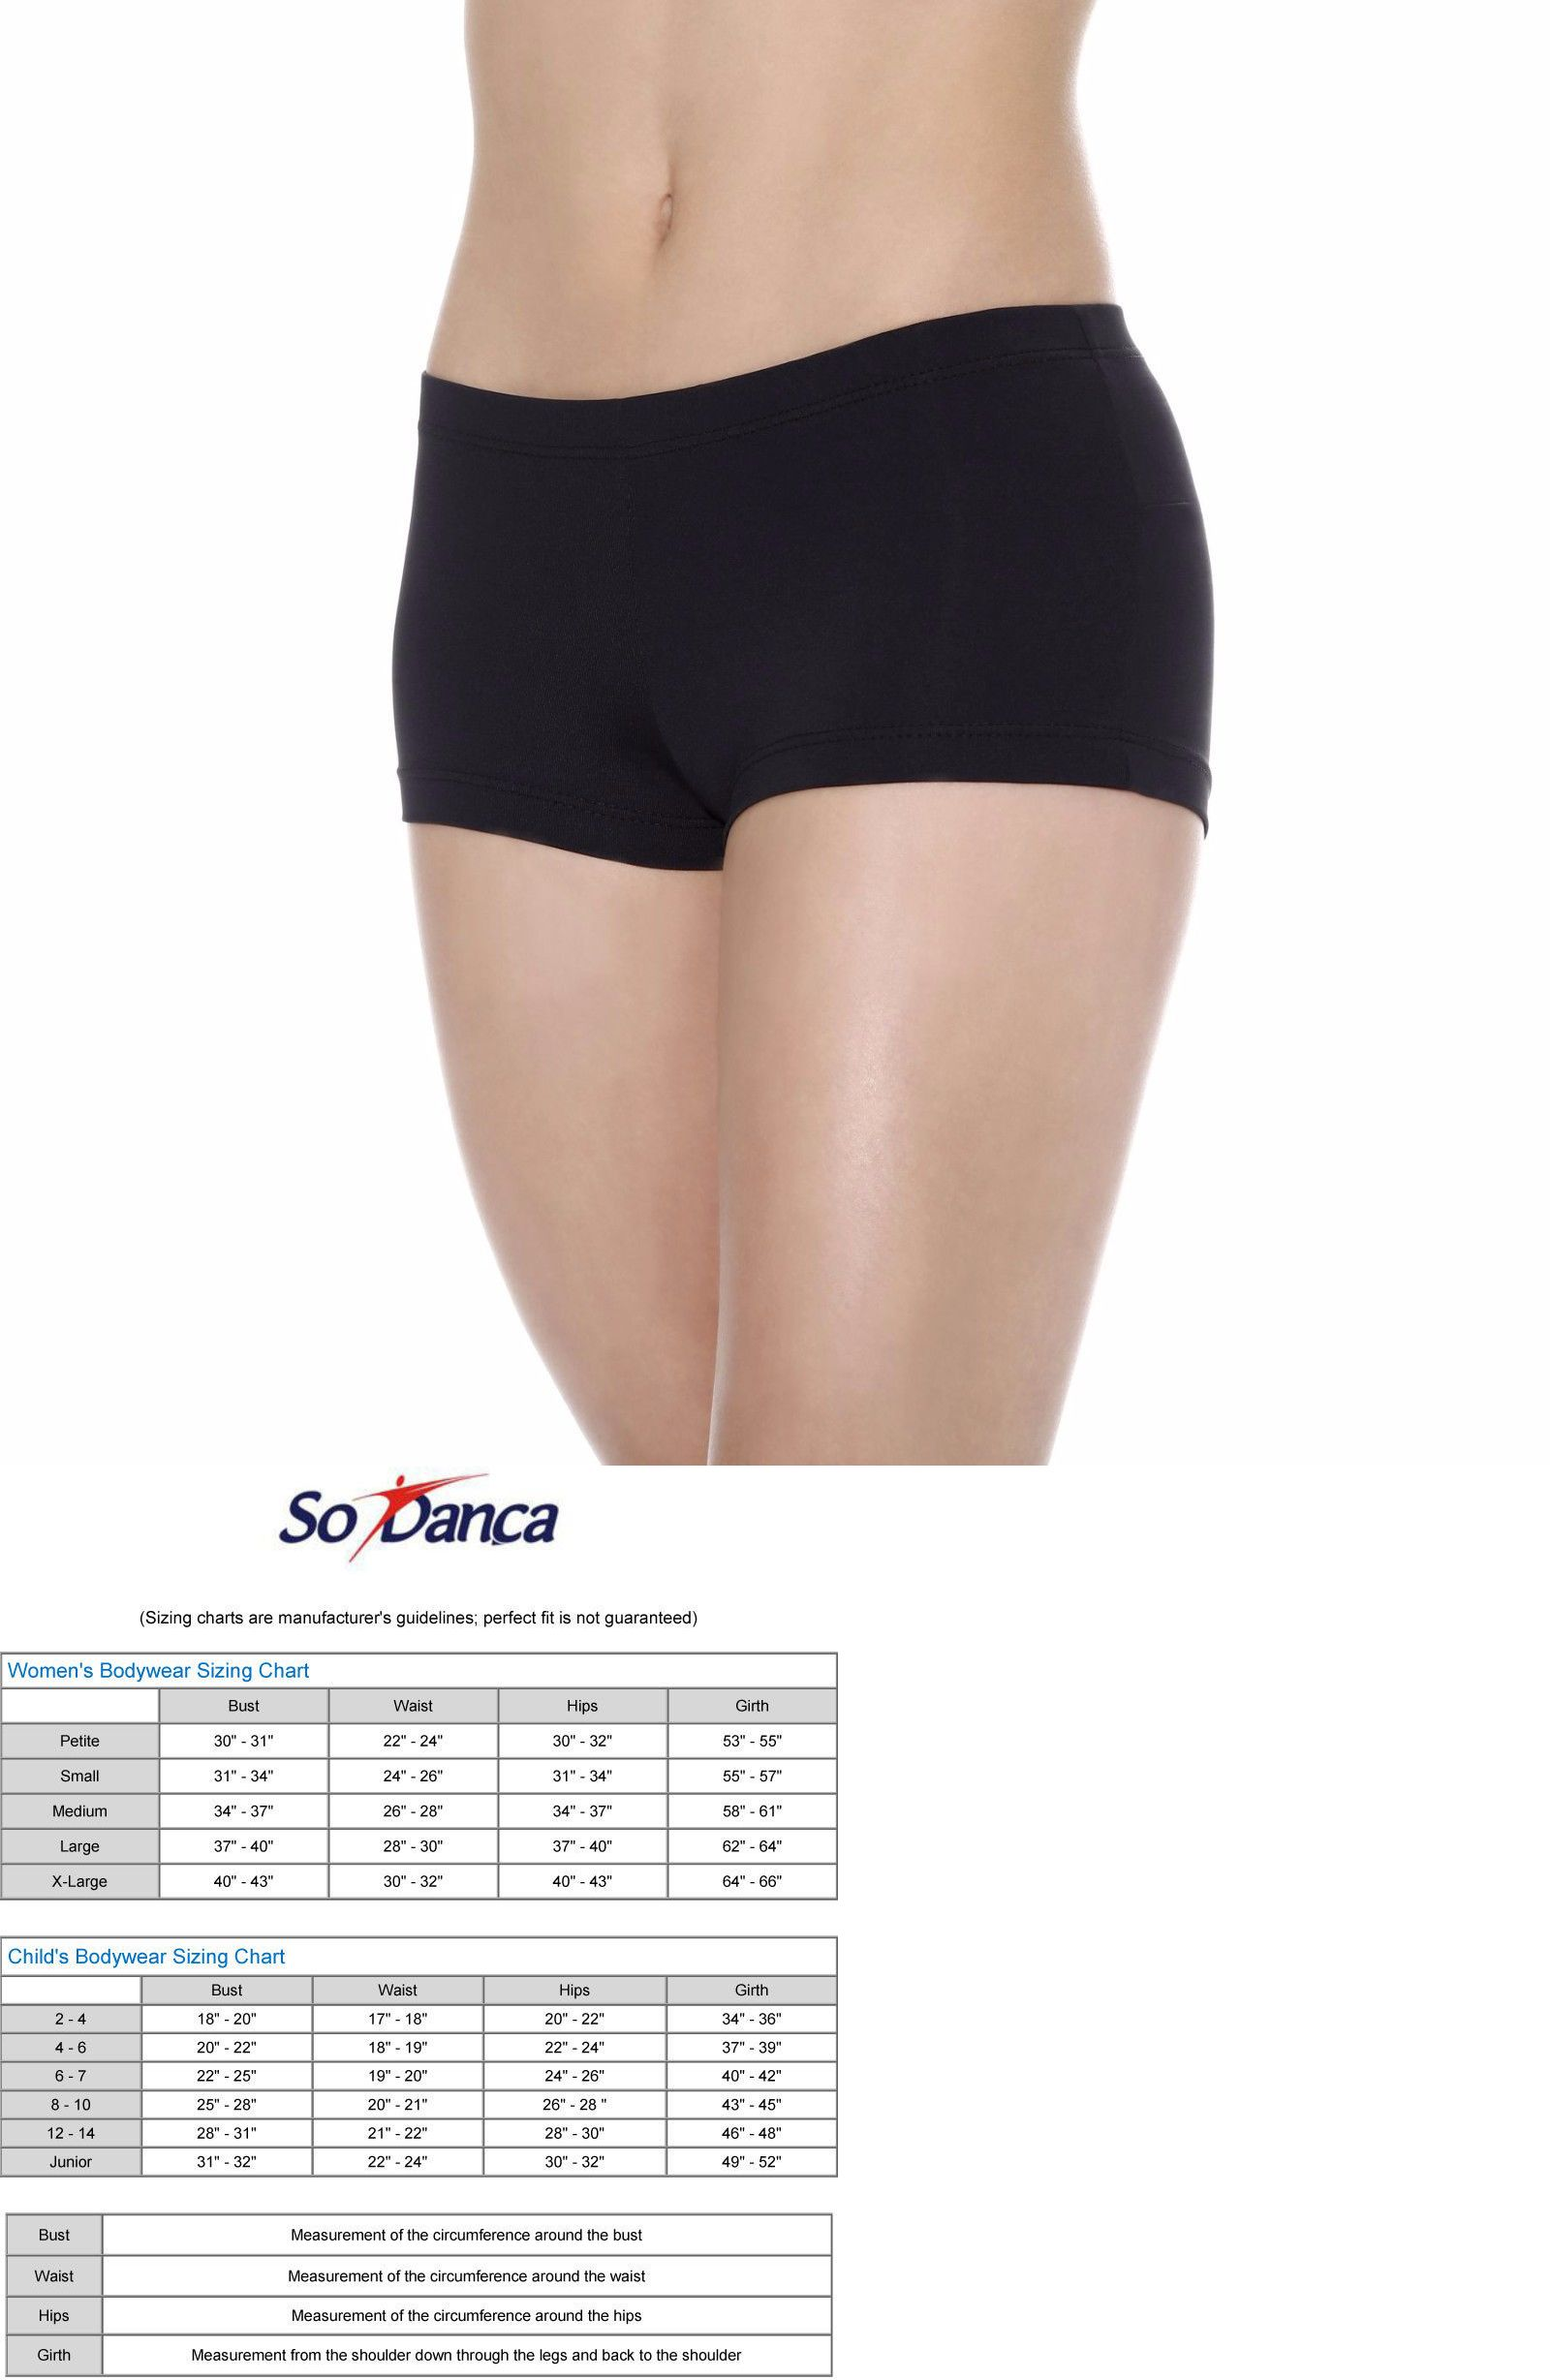 ef5c8b6b8 Pants and Shorts 163138  So Danca Ladies Low Rise Dance Booty Shorts ...